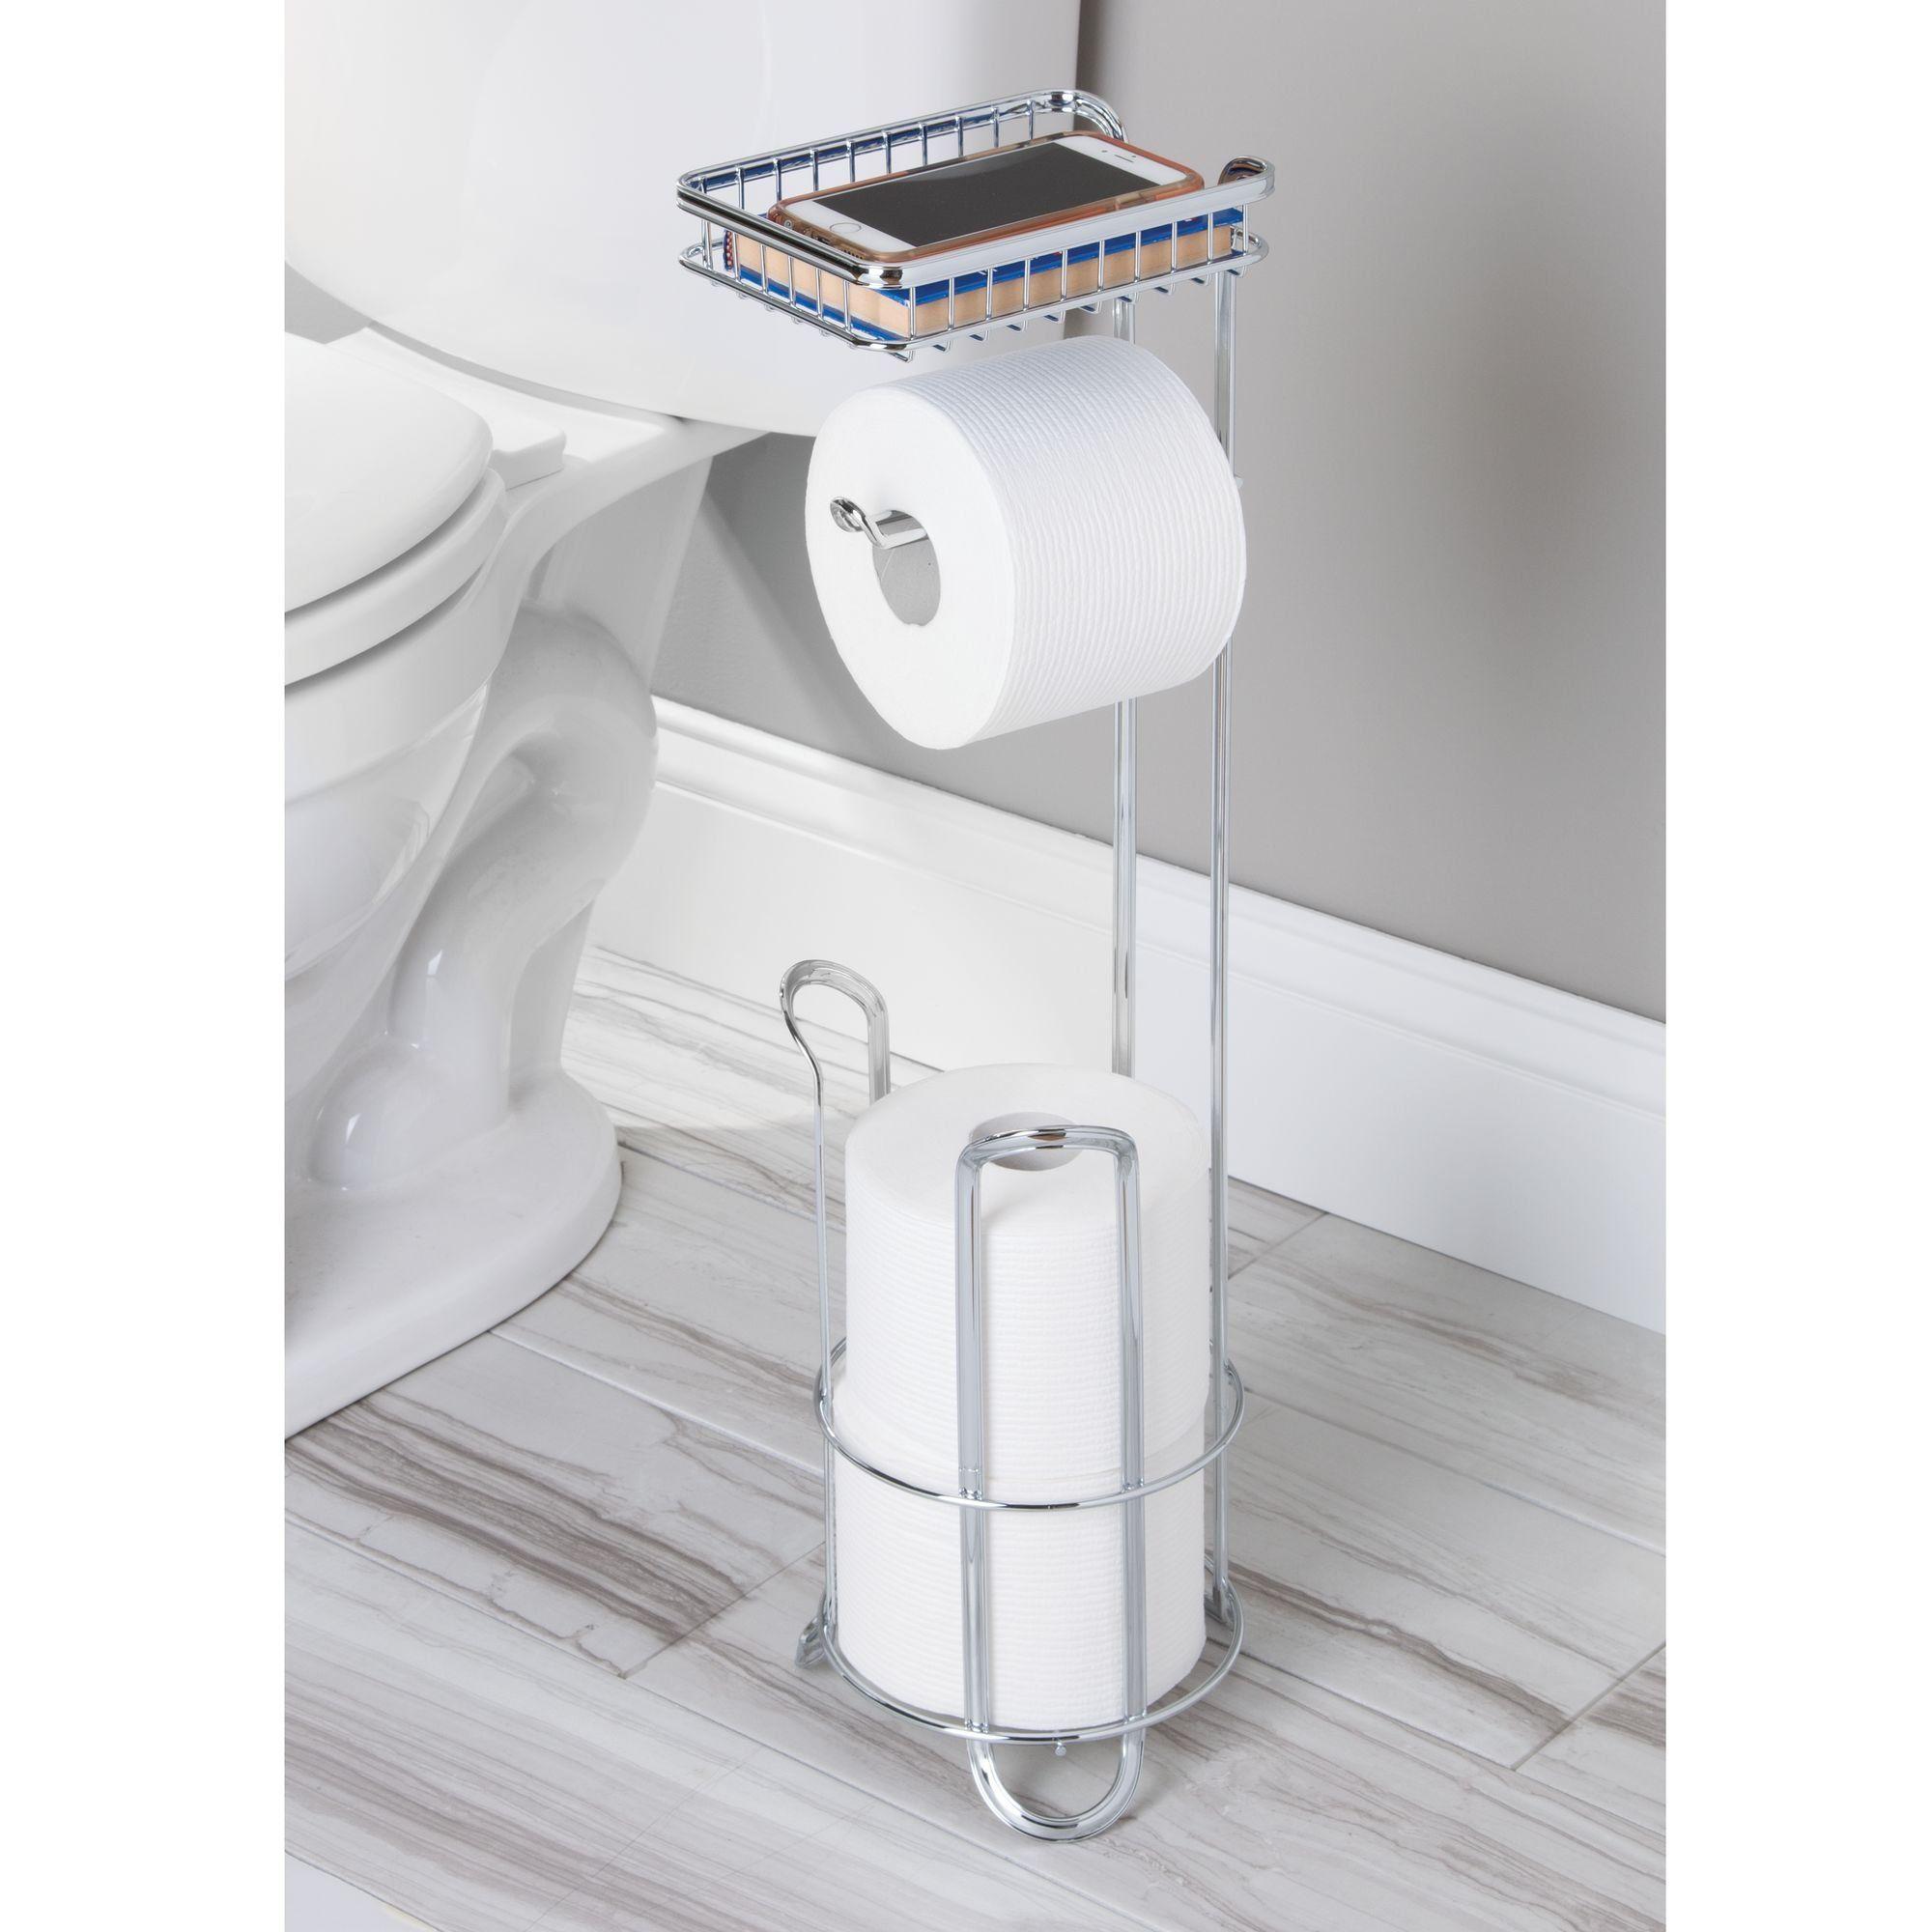 Metrodecor Mdesign Free Standing Toilet Paper Holder With Shelf For Bathroom Chrome Details Bathroom Storage Organization Toilet Paper Toilet Paper Holder